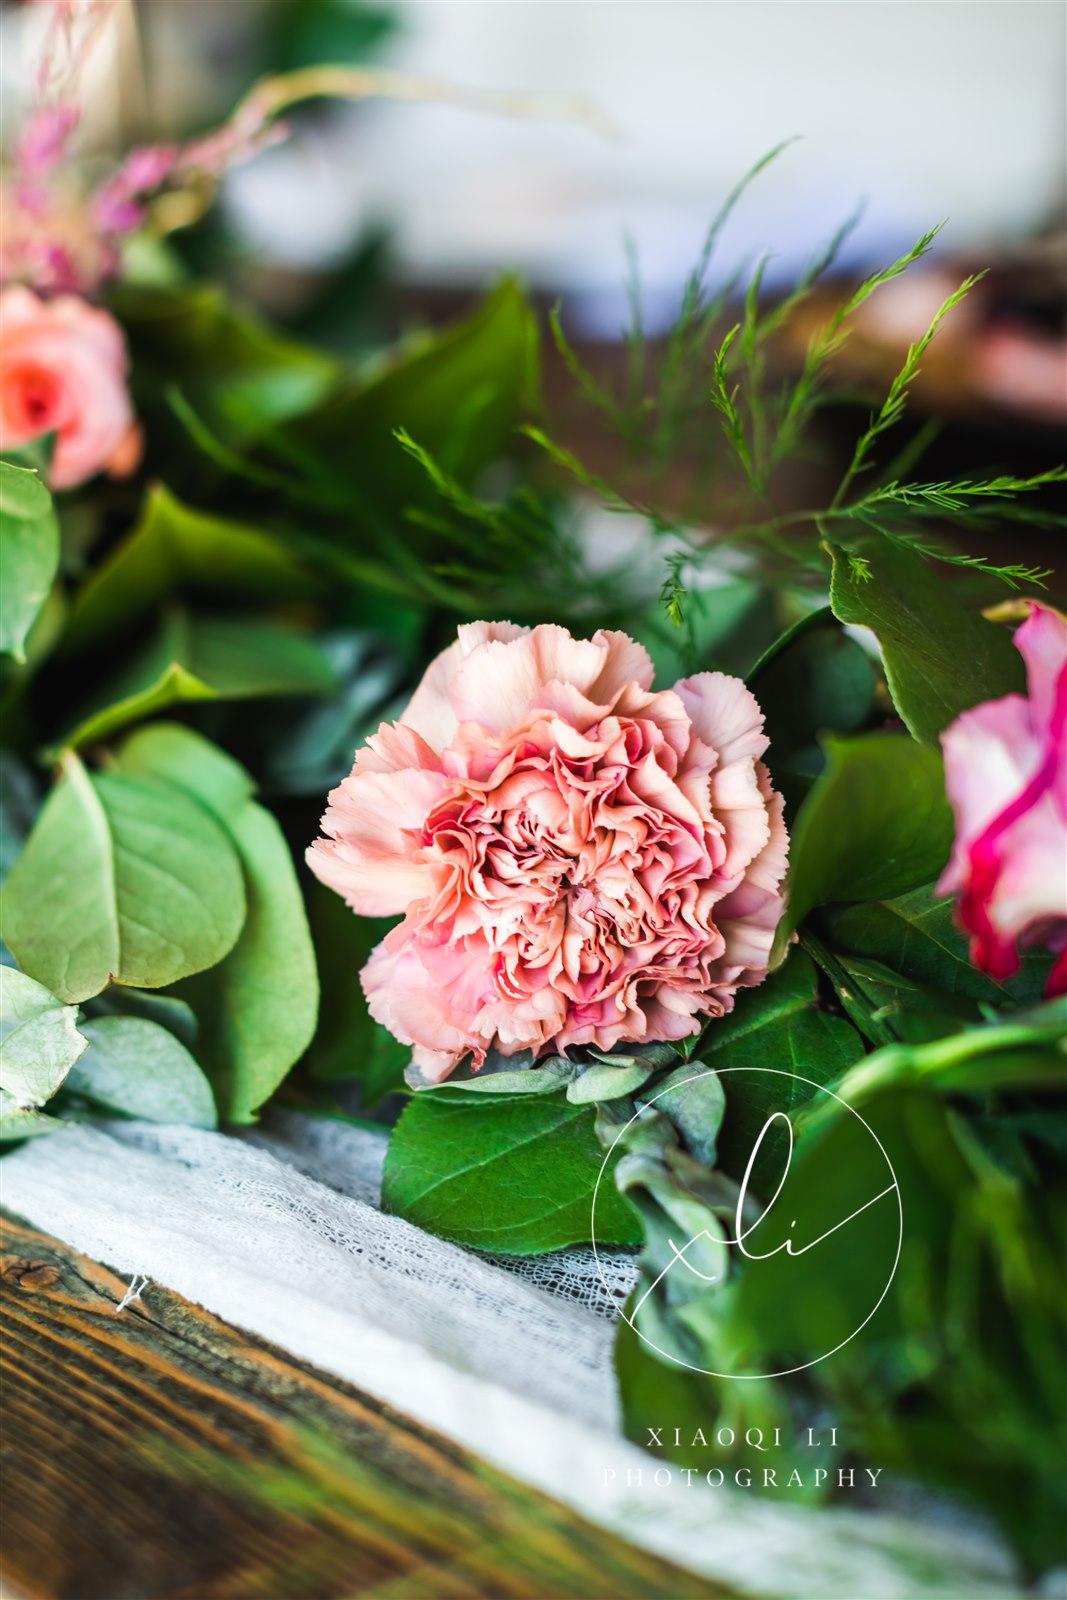 Xiaoqi-Li-Photography-Vendors-San-Antonio-Spanish-Inspired-Styled-Wedding-Gallery-078.jpg